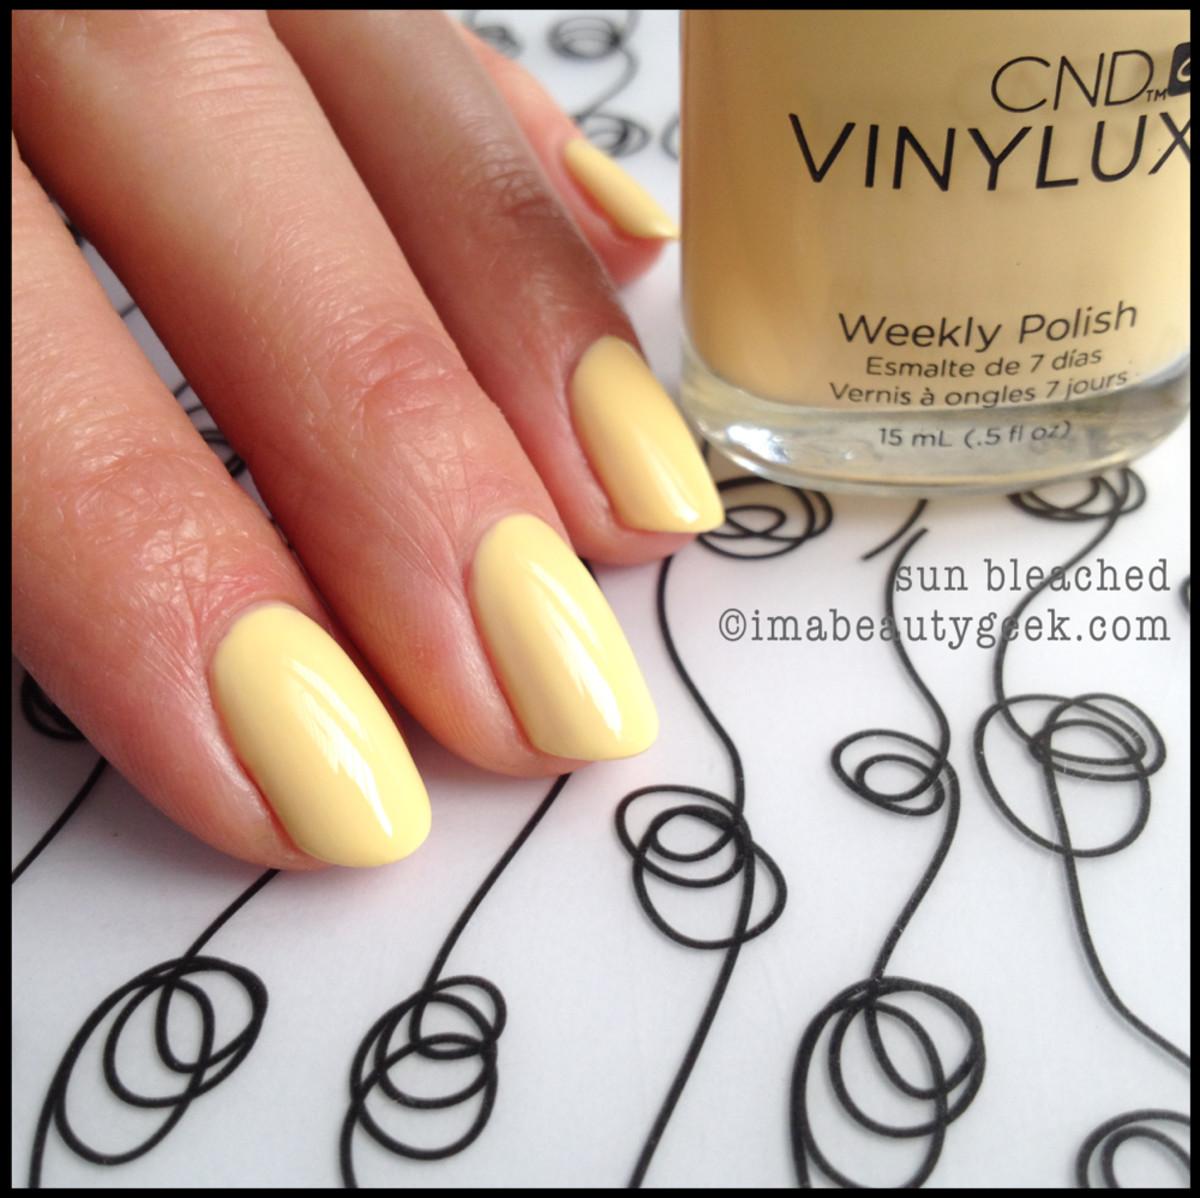 CND Vinylux Sun Bleached_CND Vinylux Spring 2014